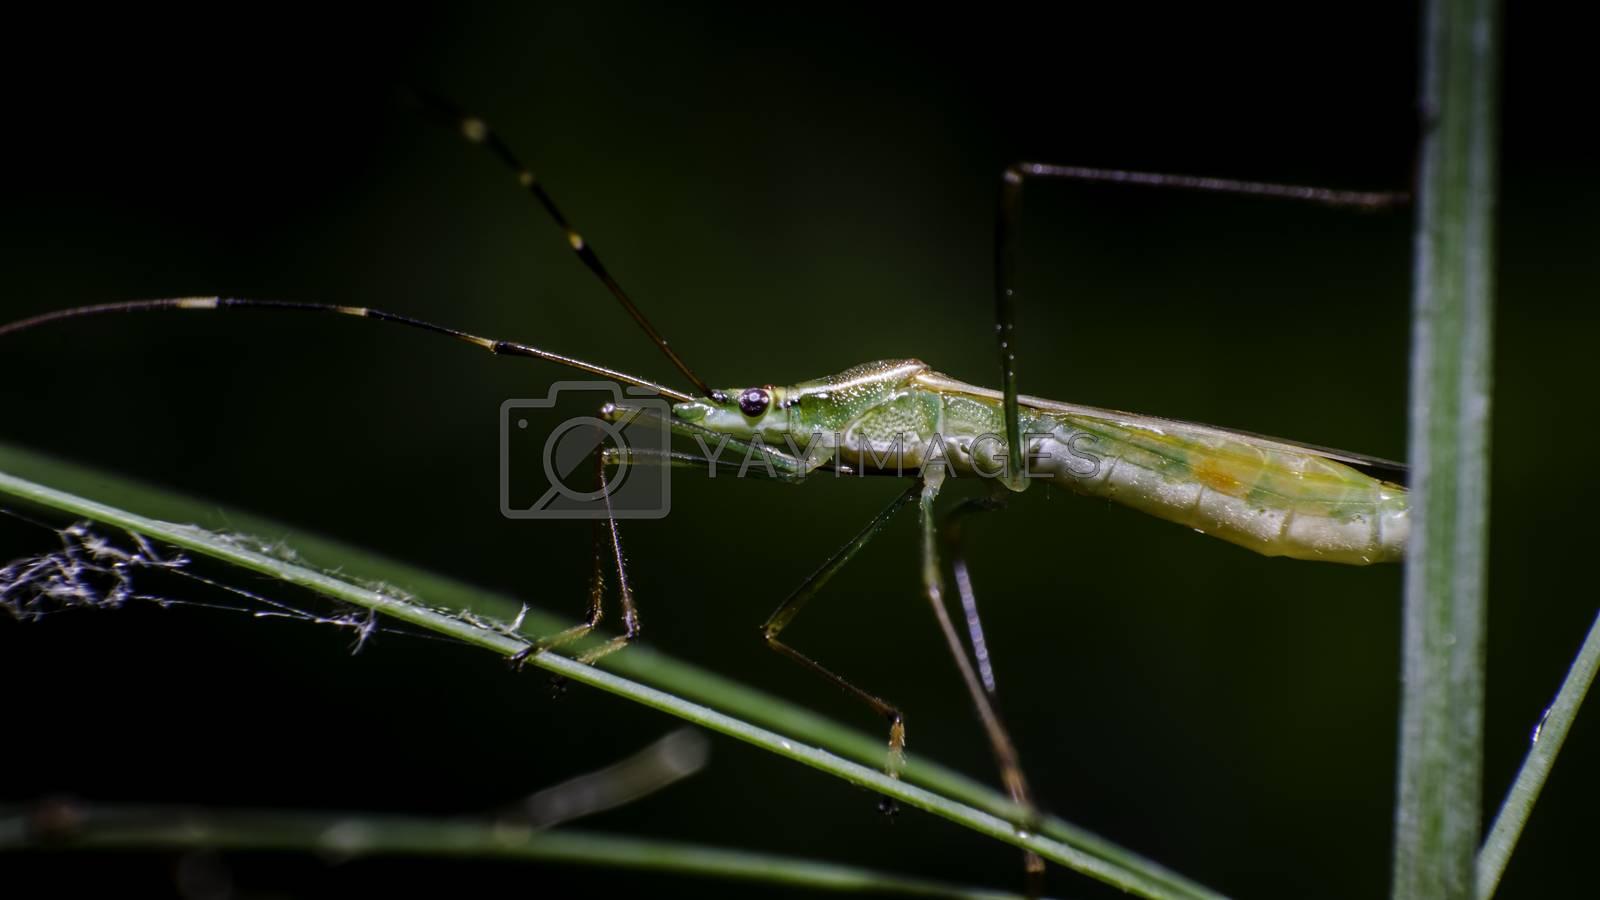 Grasshopper on grass branch, Macro shot